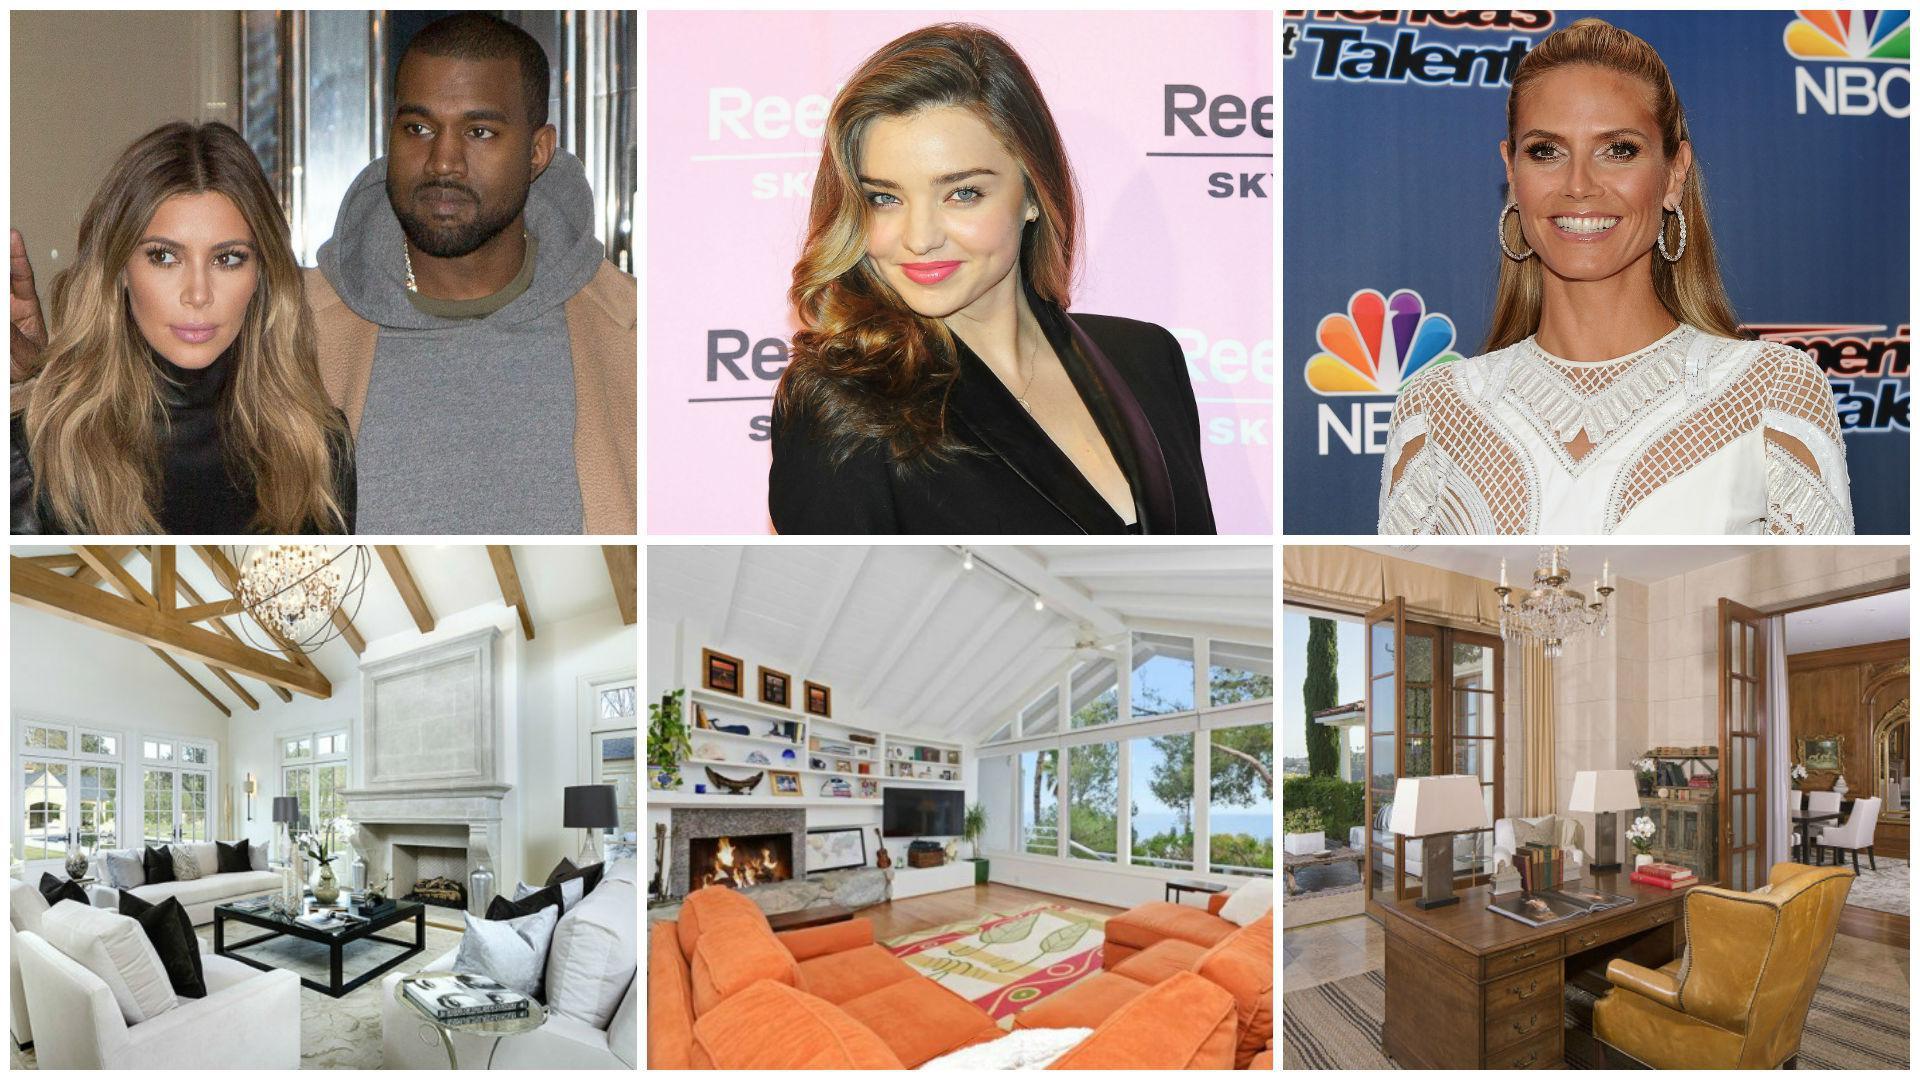 Celebrity real estate: Kim Kardashian, Miranda Kerr and Heidi Klum hit the housing market